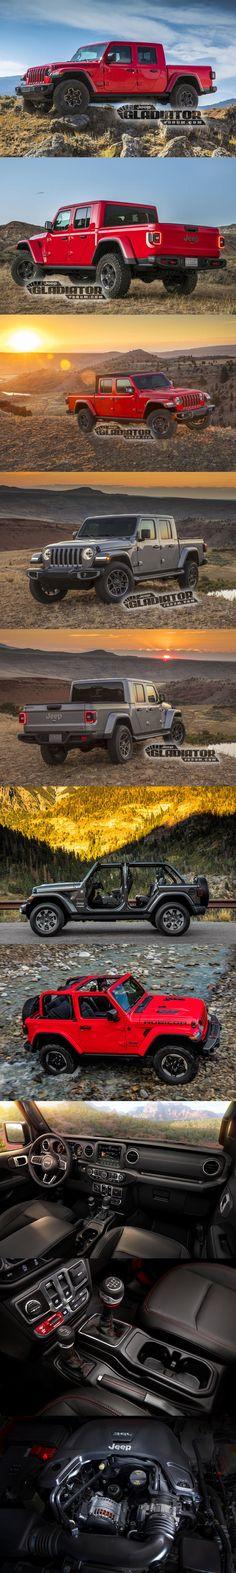 58 best jeep news images jeep news jeep cherokee parts jeep cj rh pinterest com